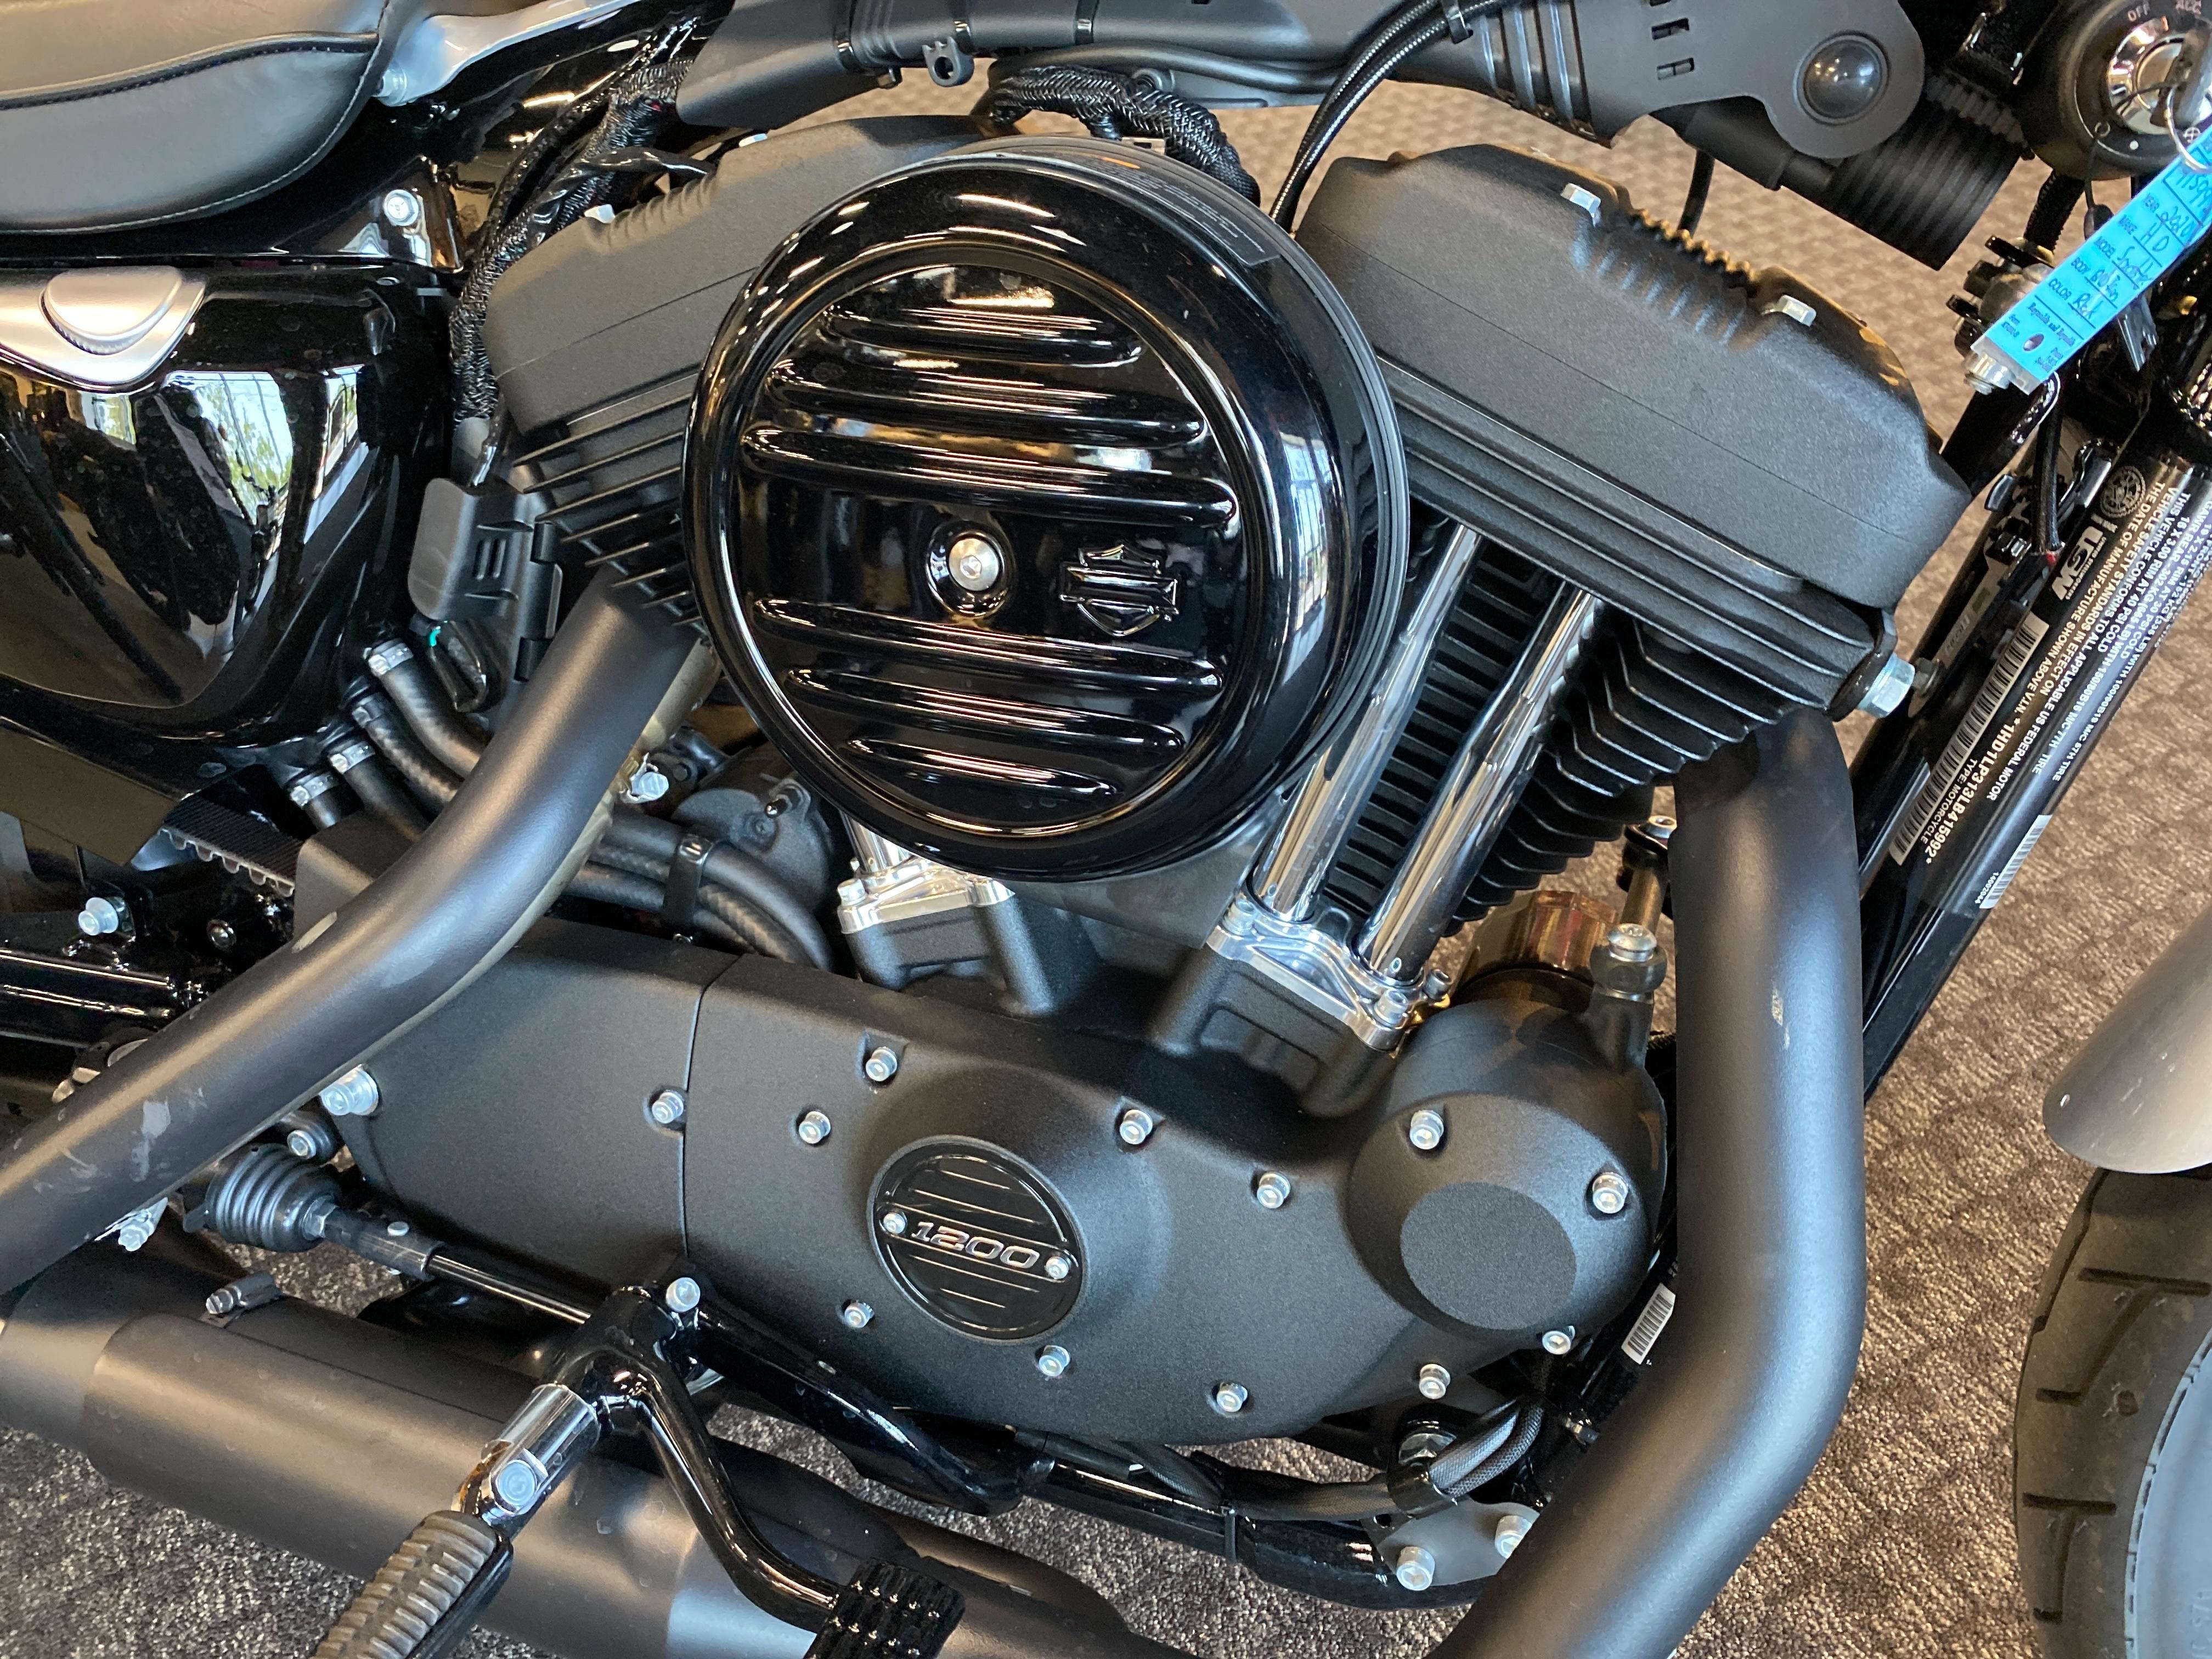 2020 Harley-Davidson Sportster Iron 1200 at Frontline Eurosports